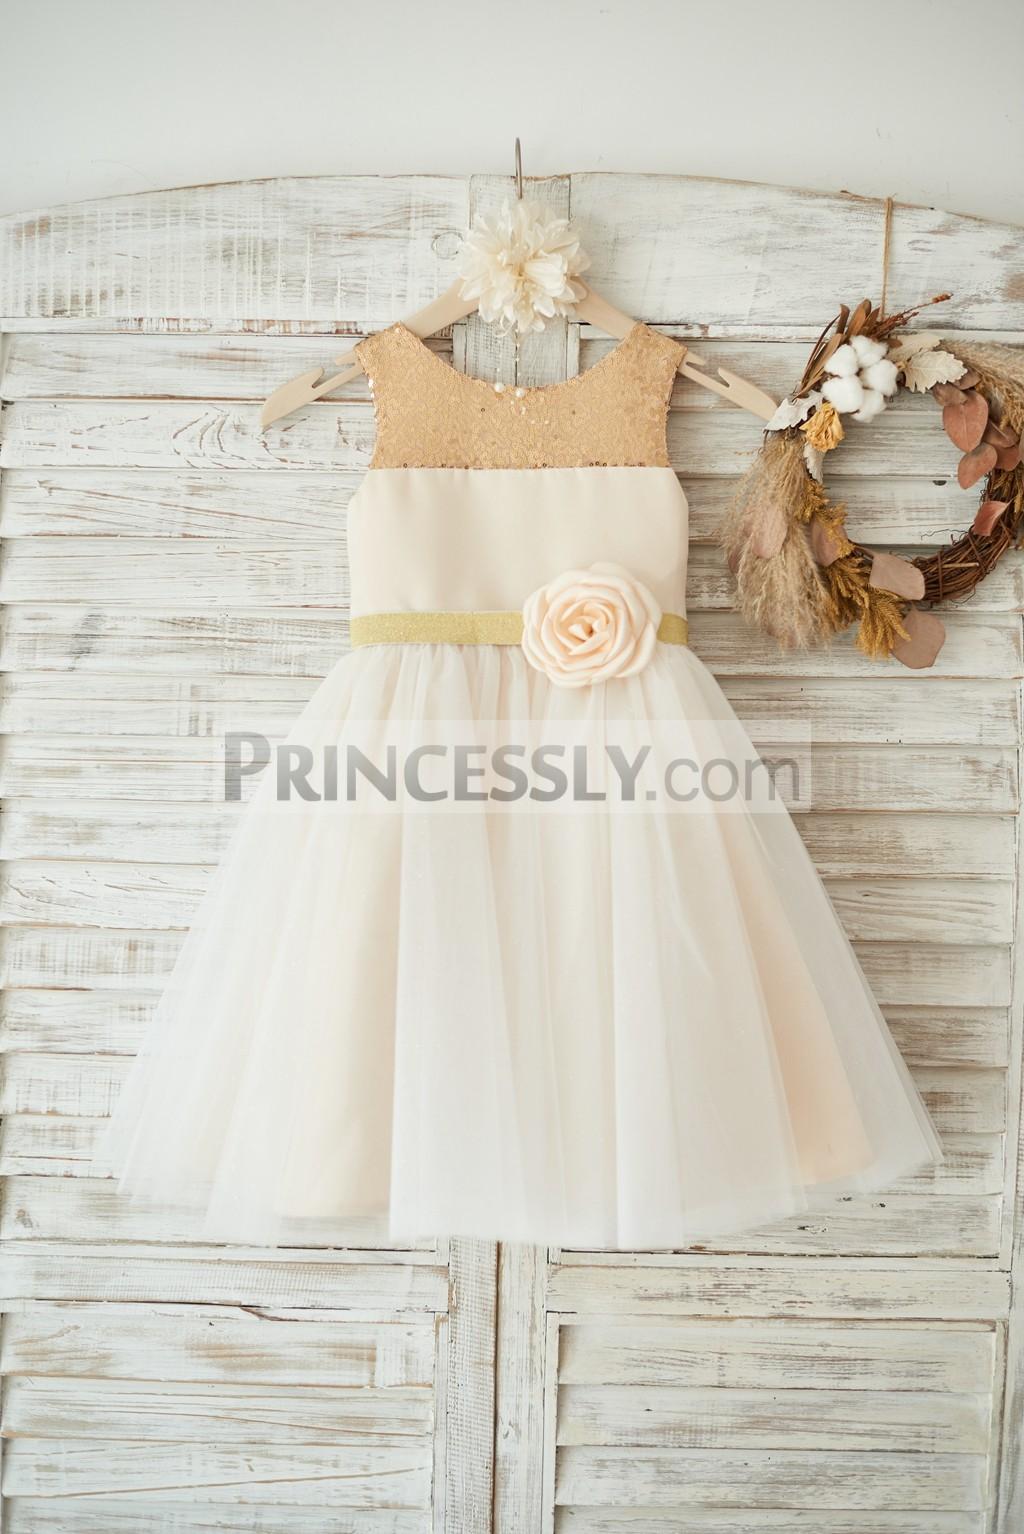 Champagne sequins neckline satin ivory tulle wedding flower girl dress